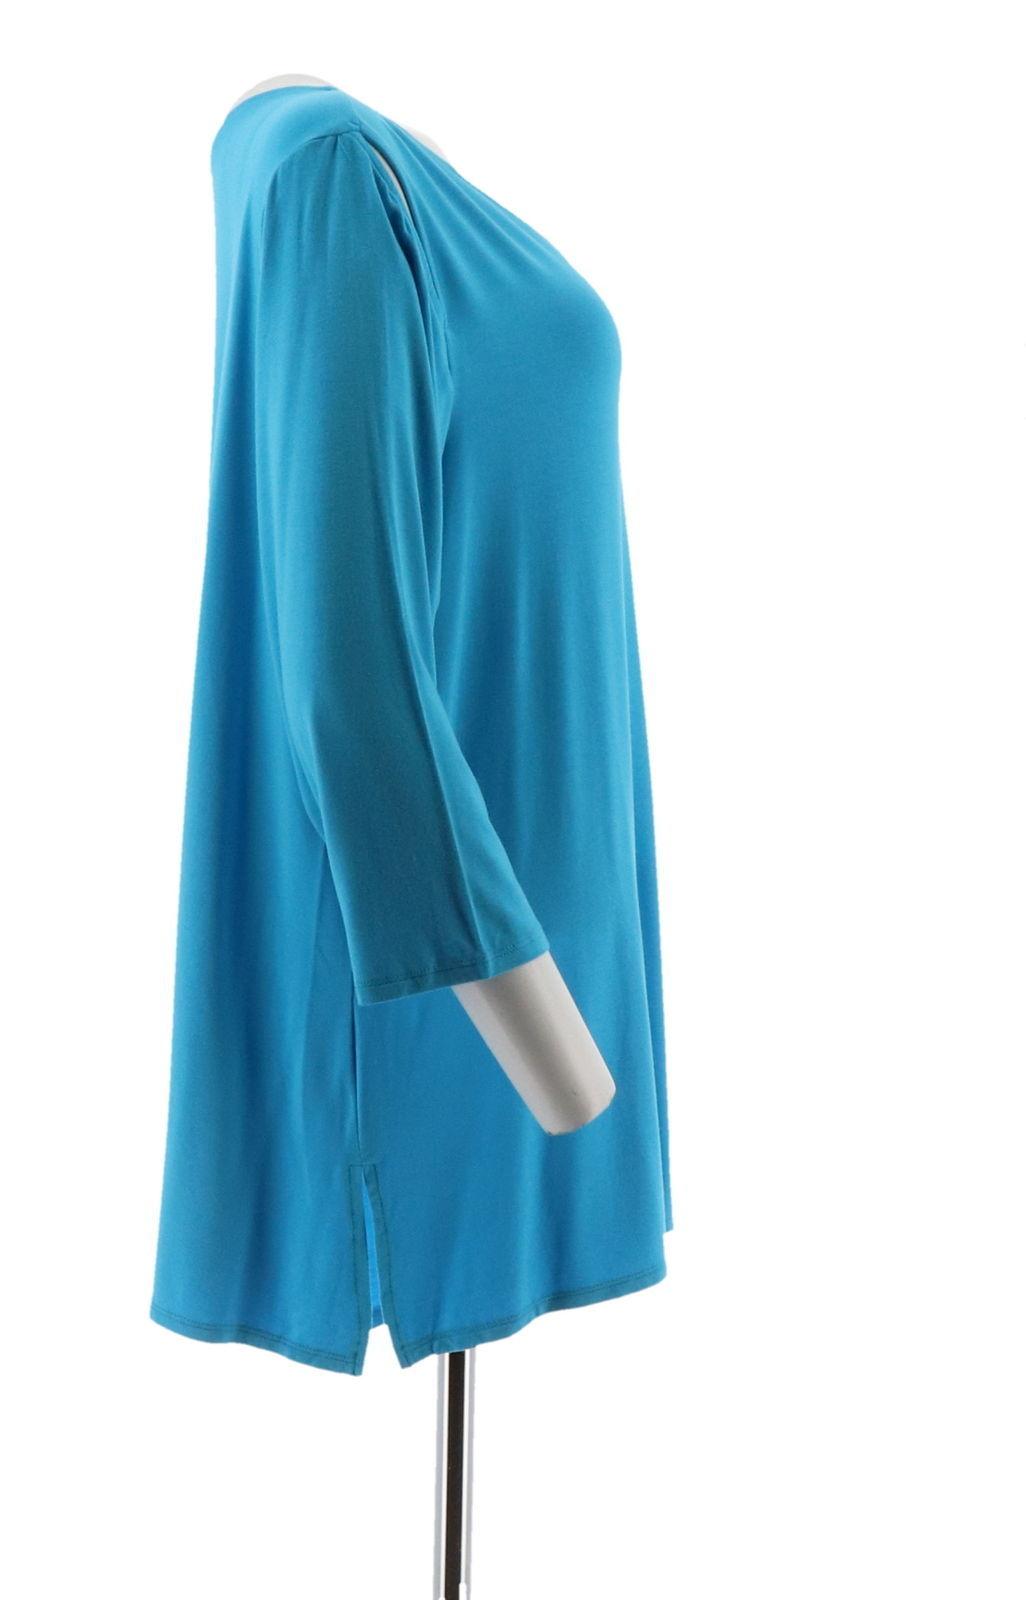 Belle Kim Gravel Knit Top Asymmetrical Hem Bright Ocean XS NEW A307422